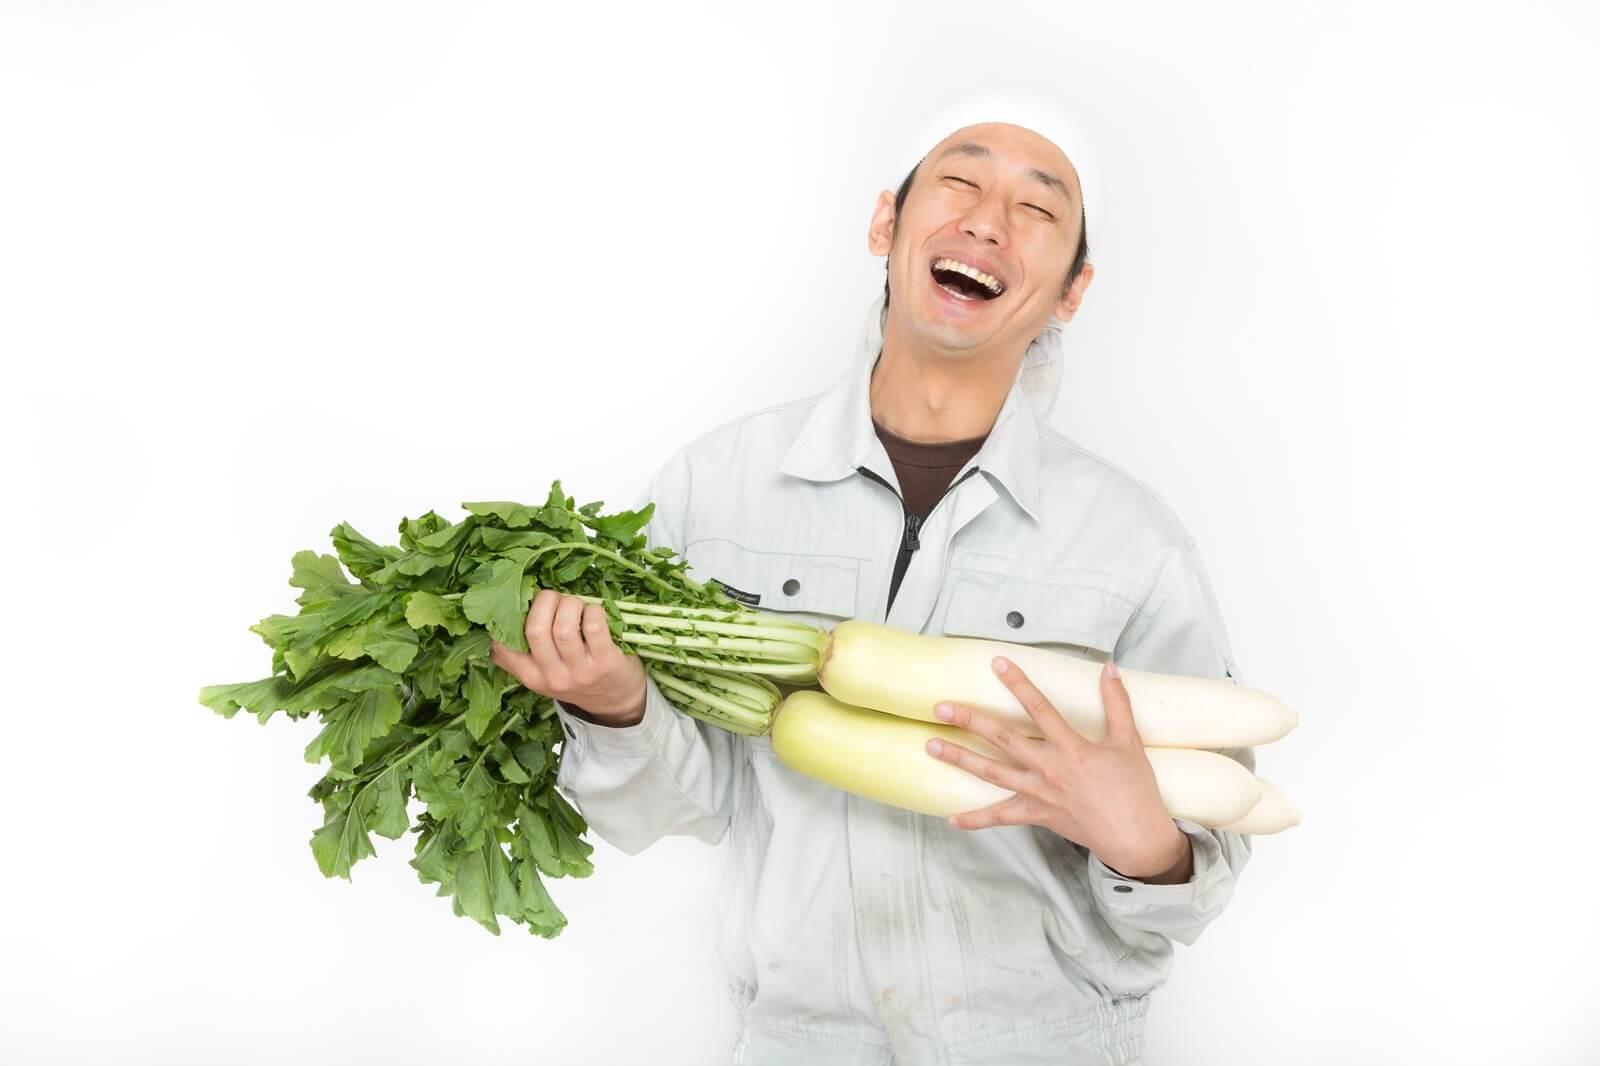 menz-furusatonouzei-yasai